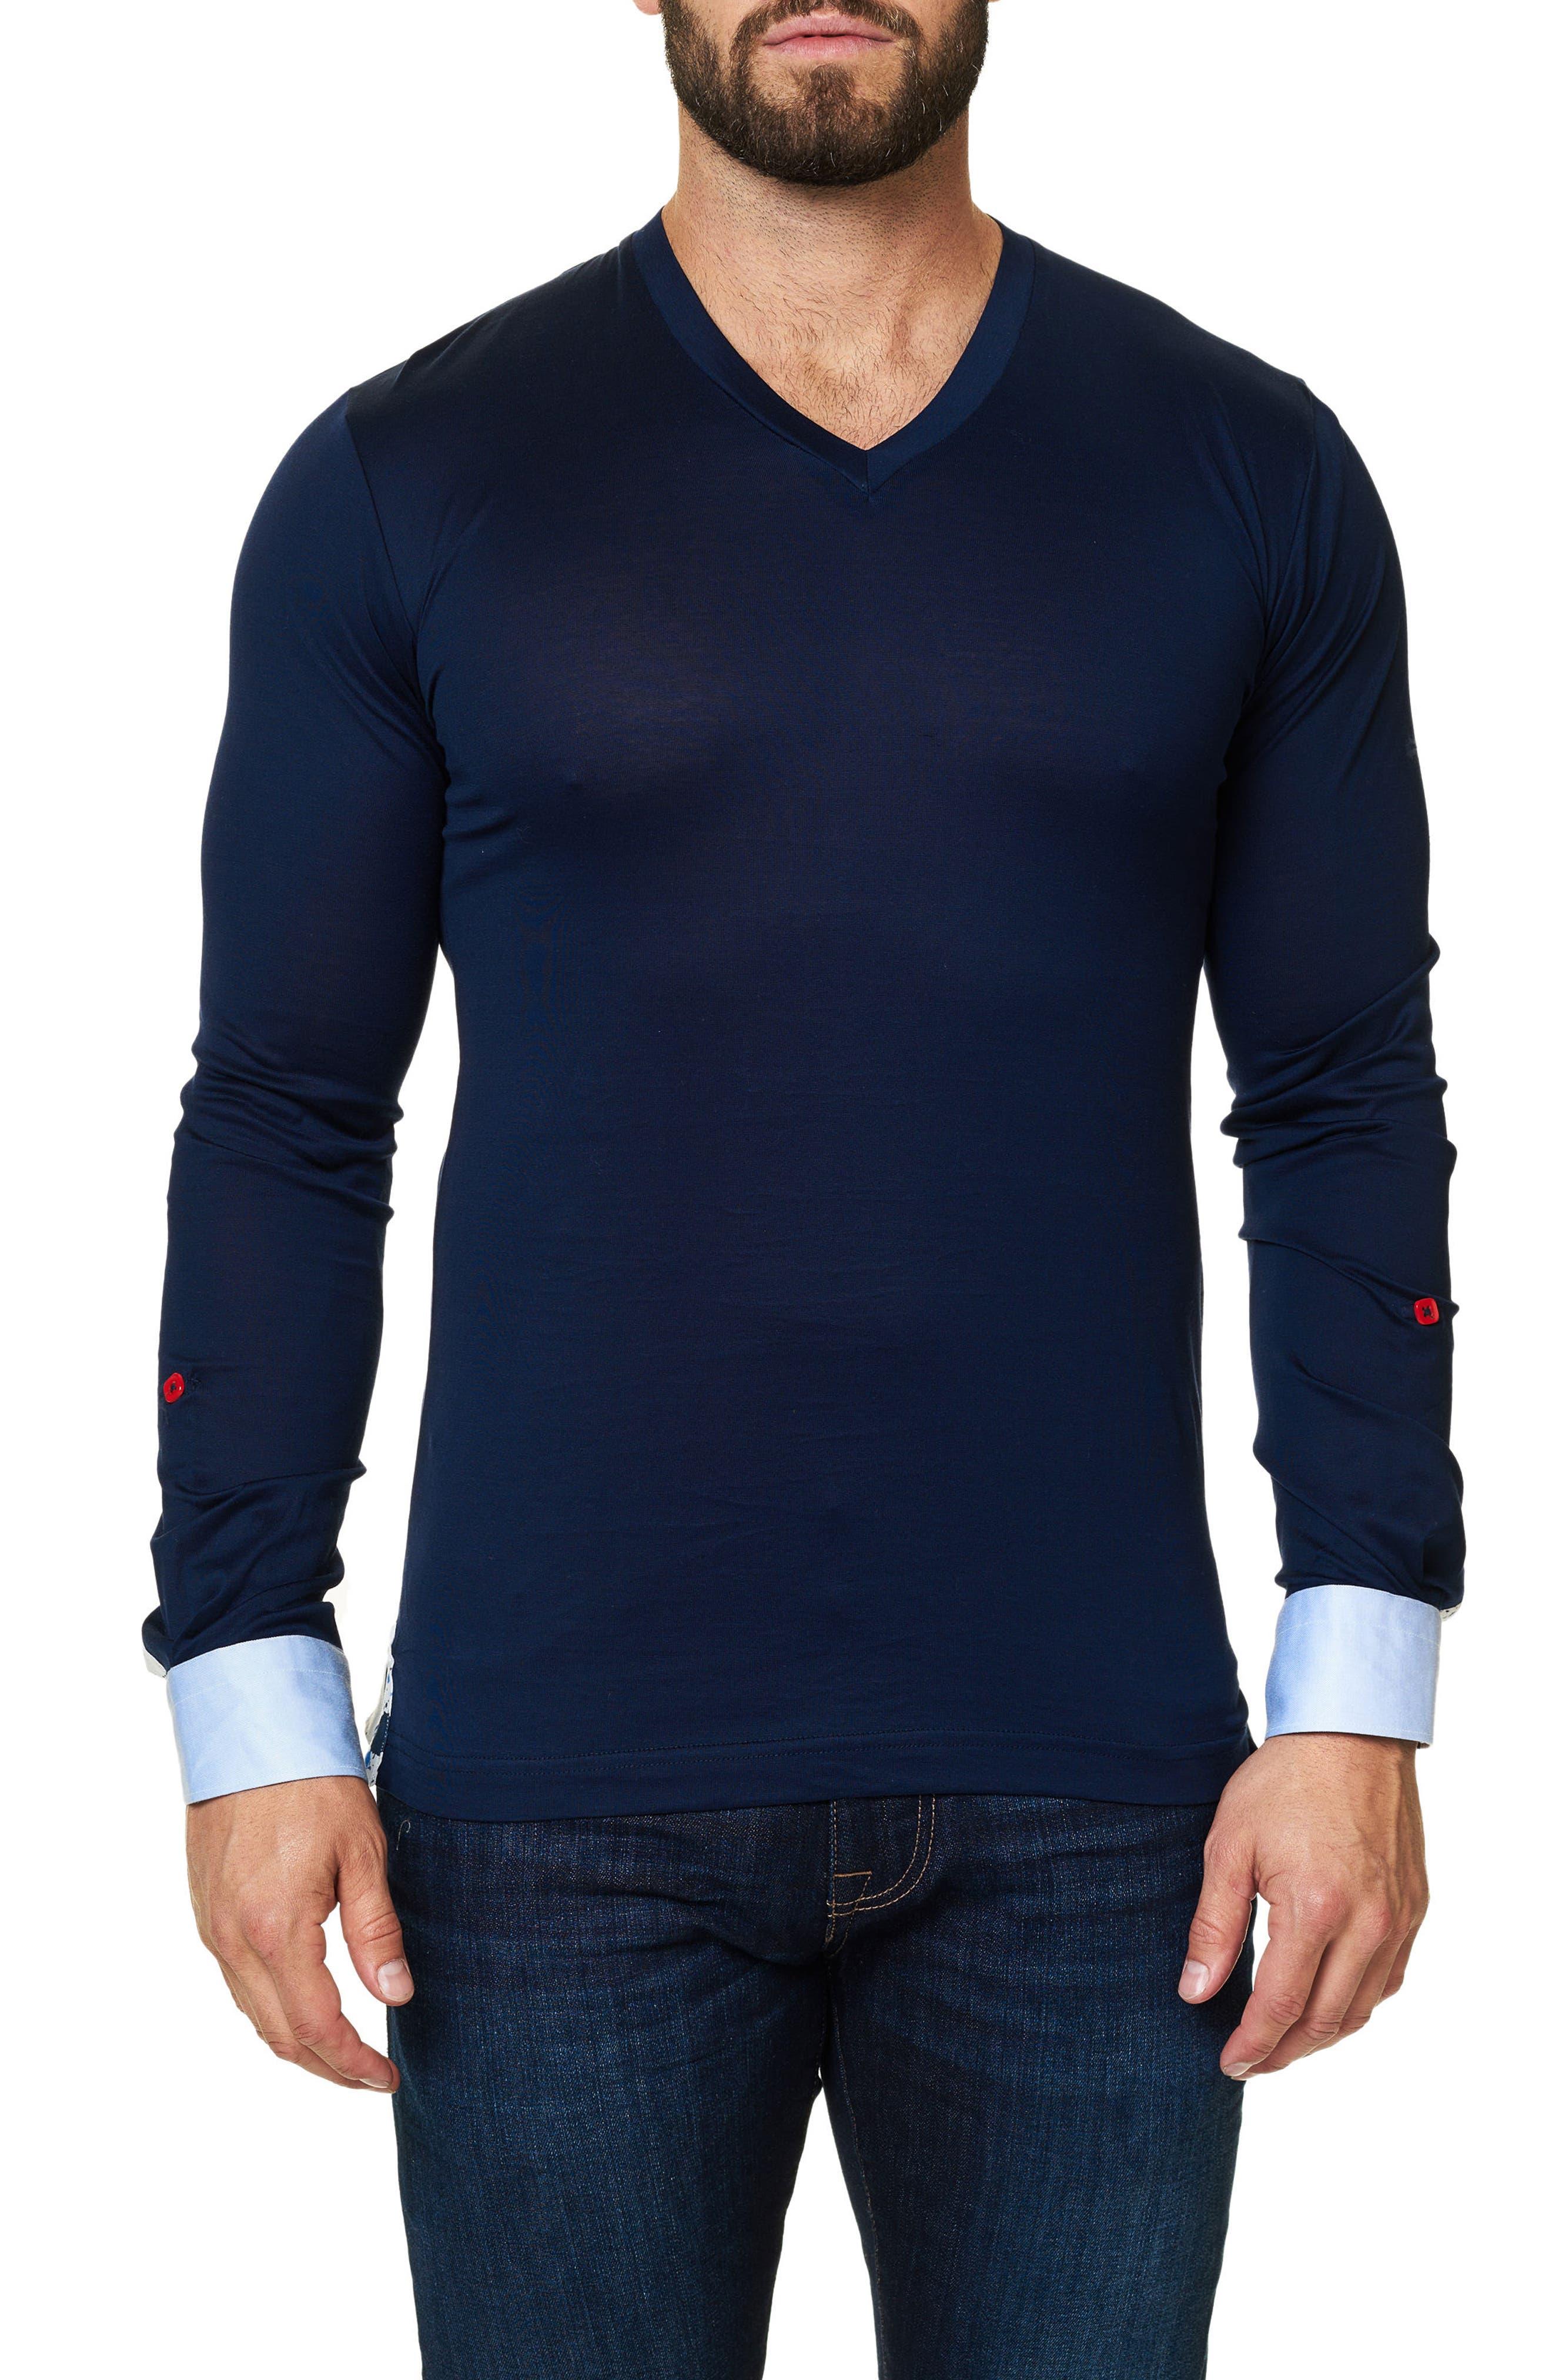 Maceoo Long Sleeve V-Neck